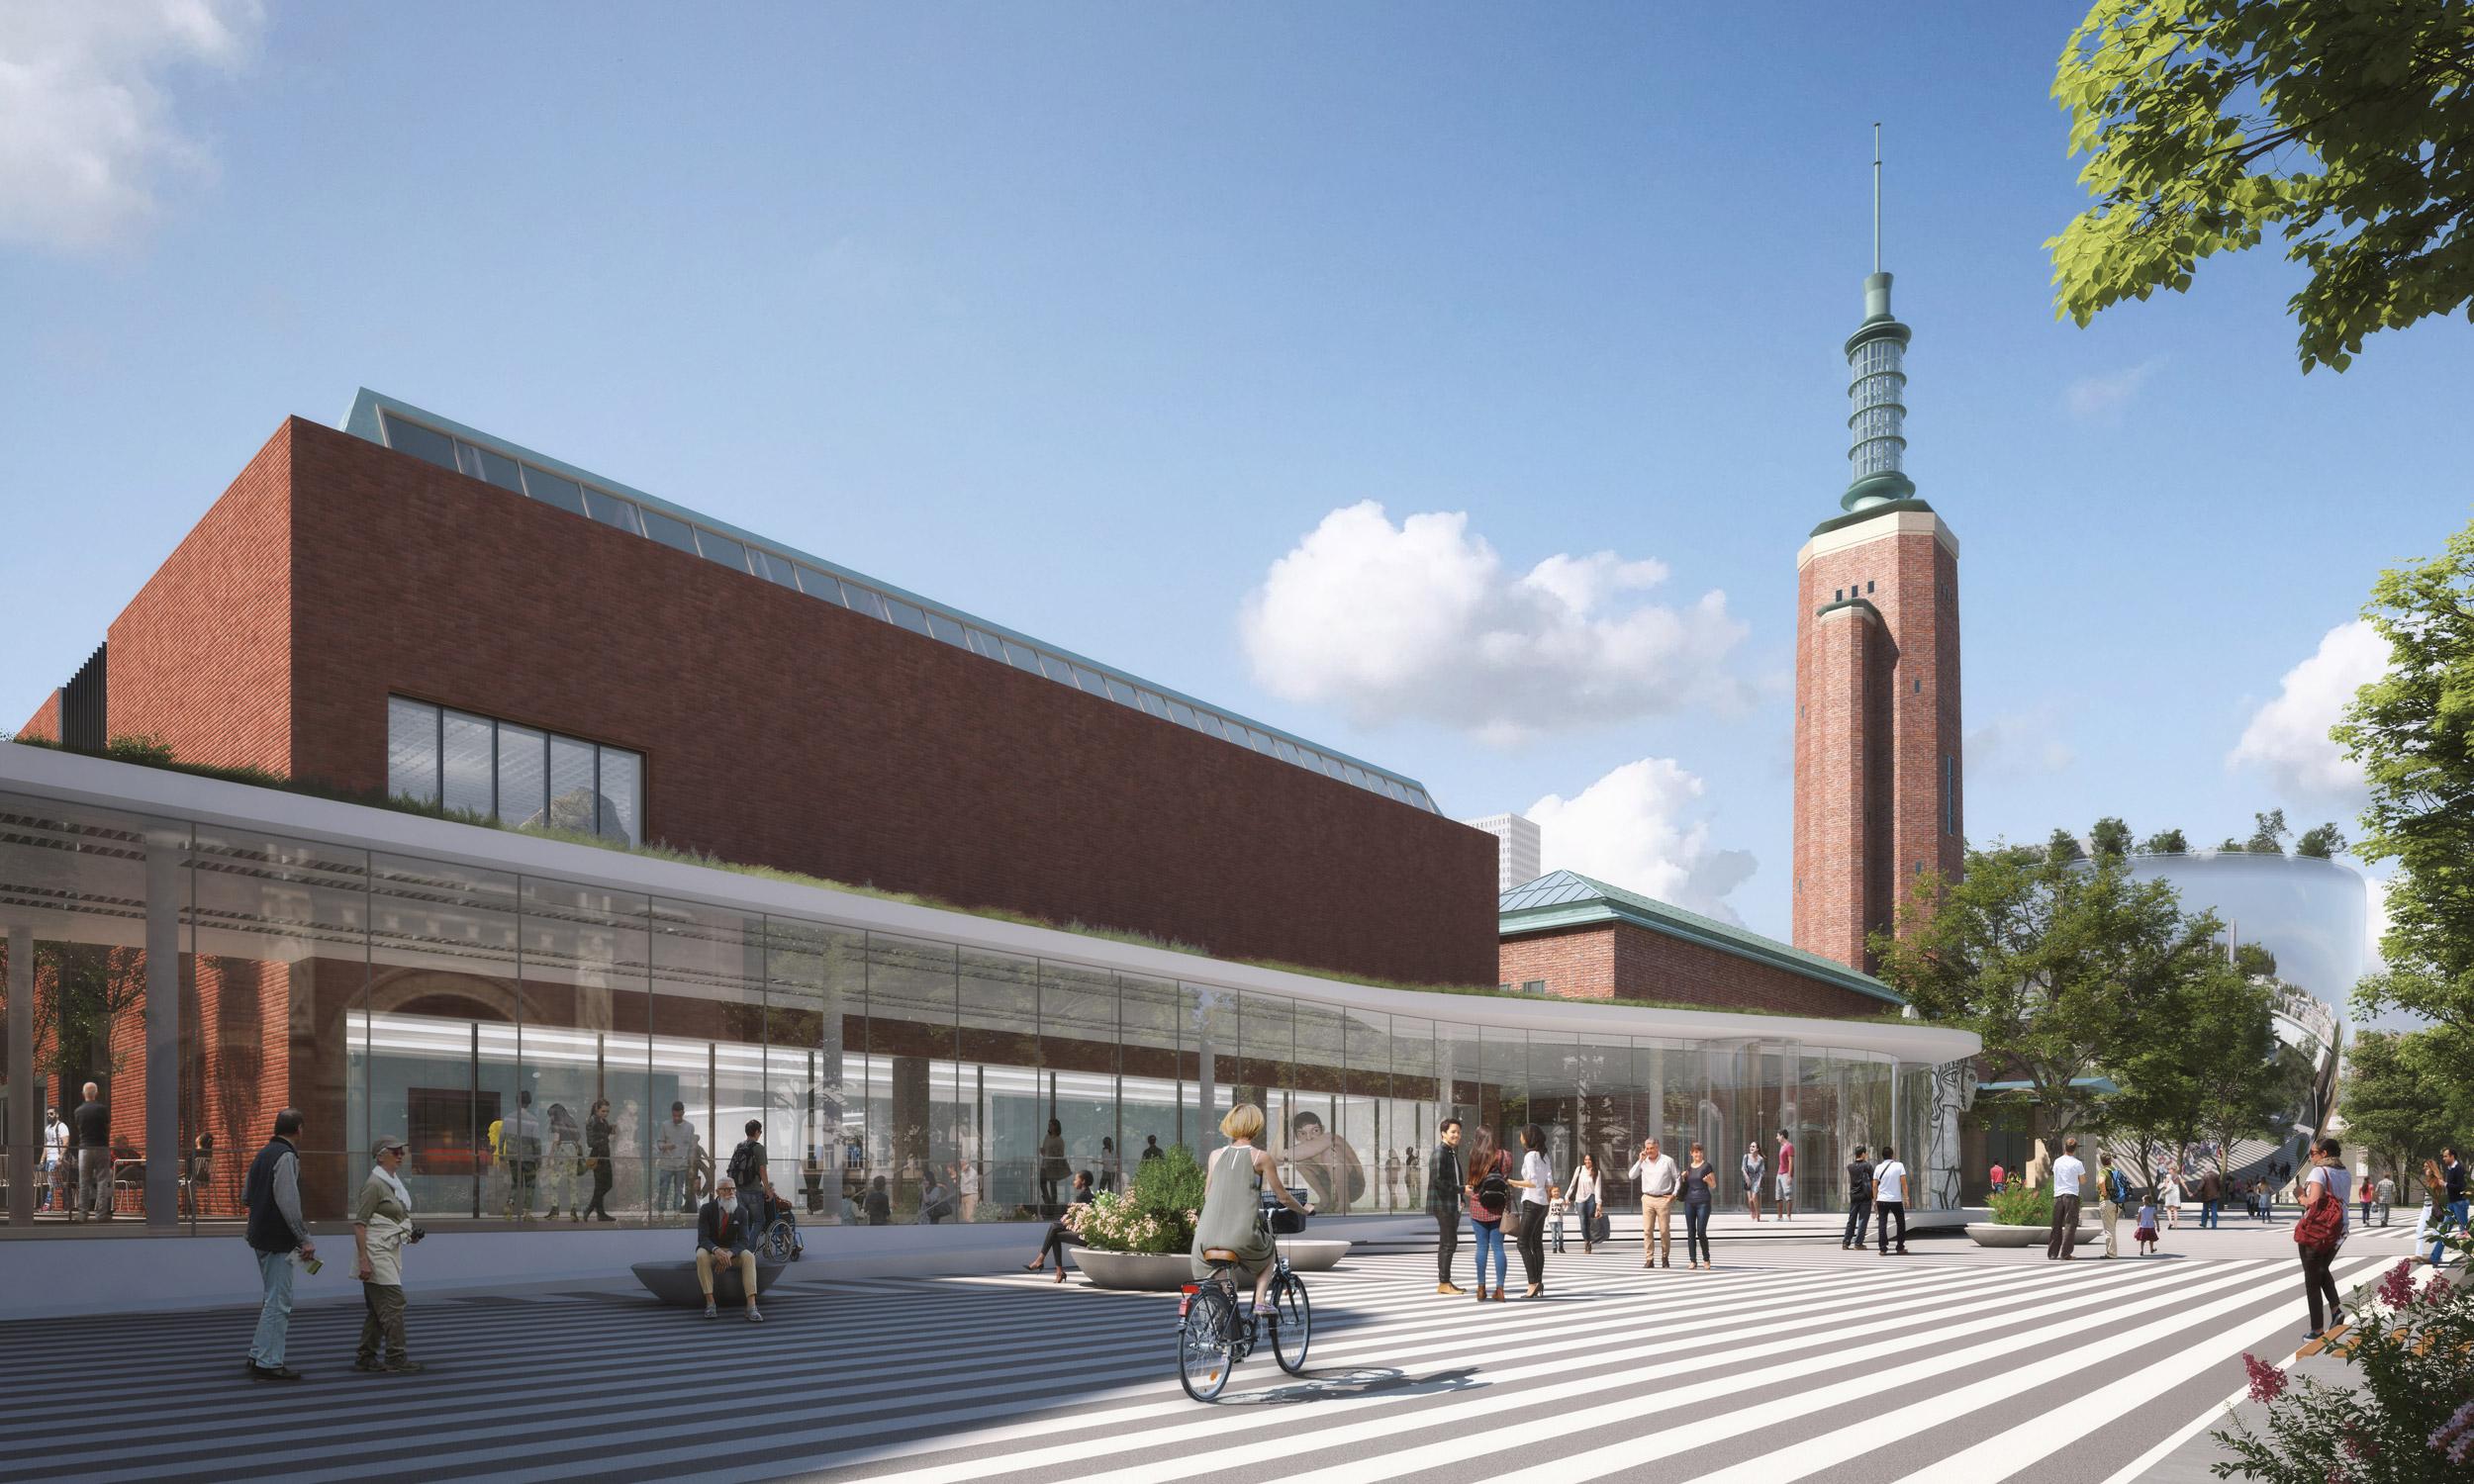 4-Museum-Boijmans-Van-Beuningen—City-entrance